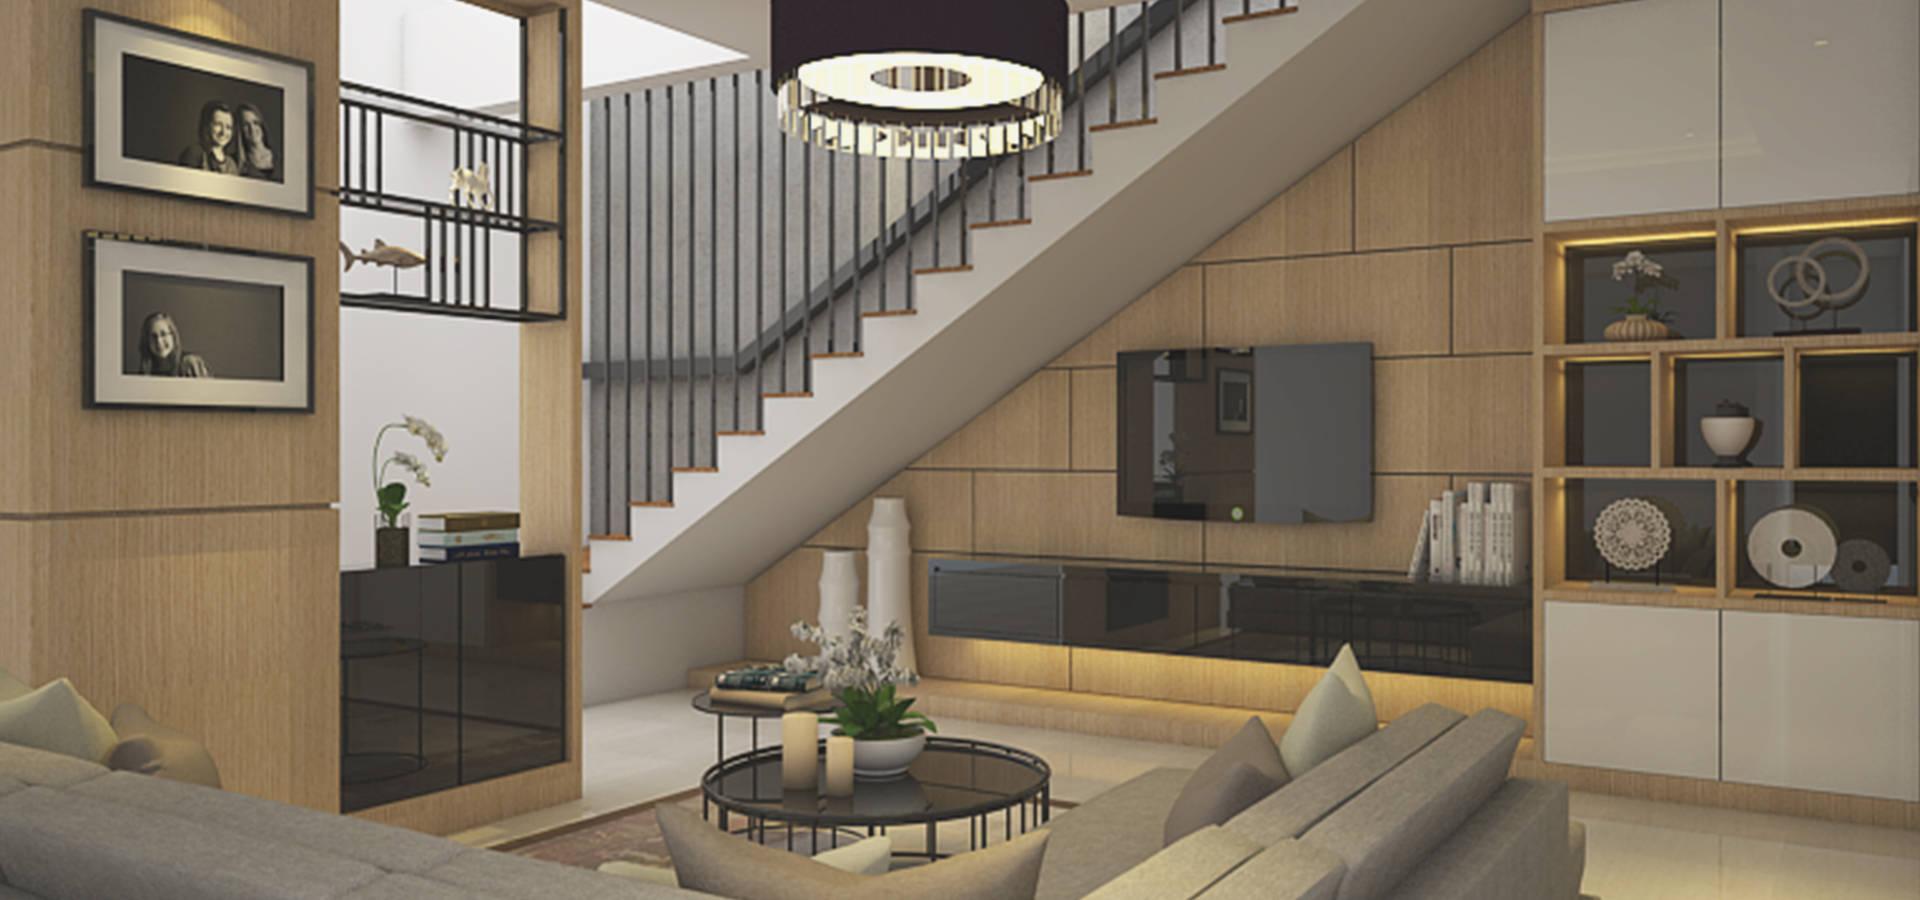 Veon Interior Studio